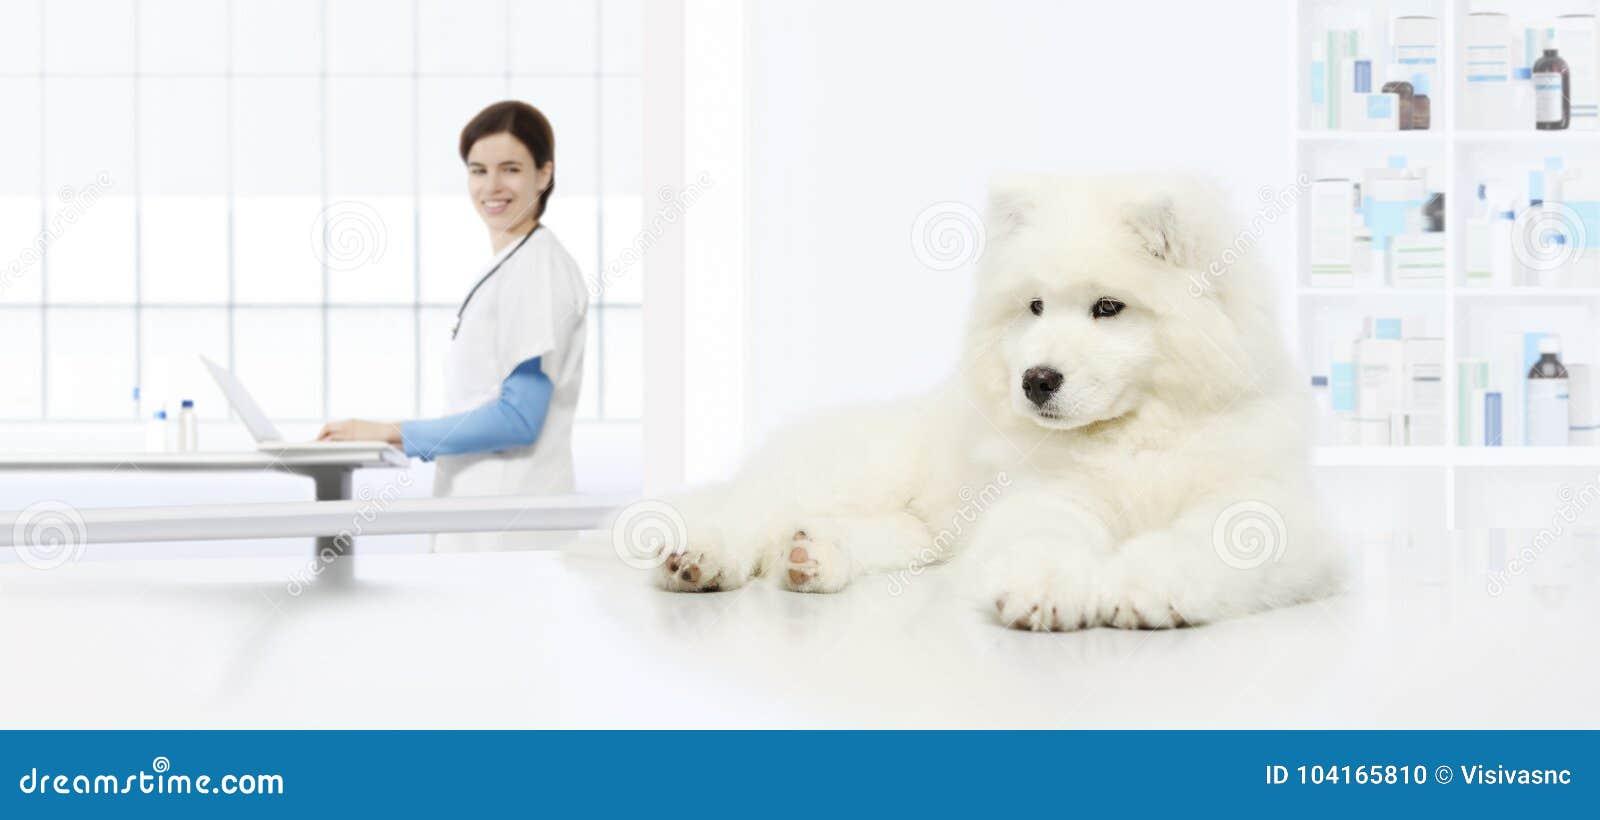 Veterinary examination dog, veterinarian with computer on table